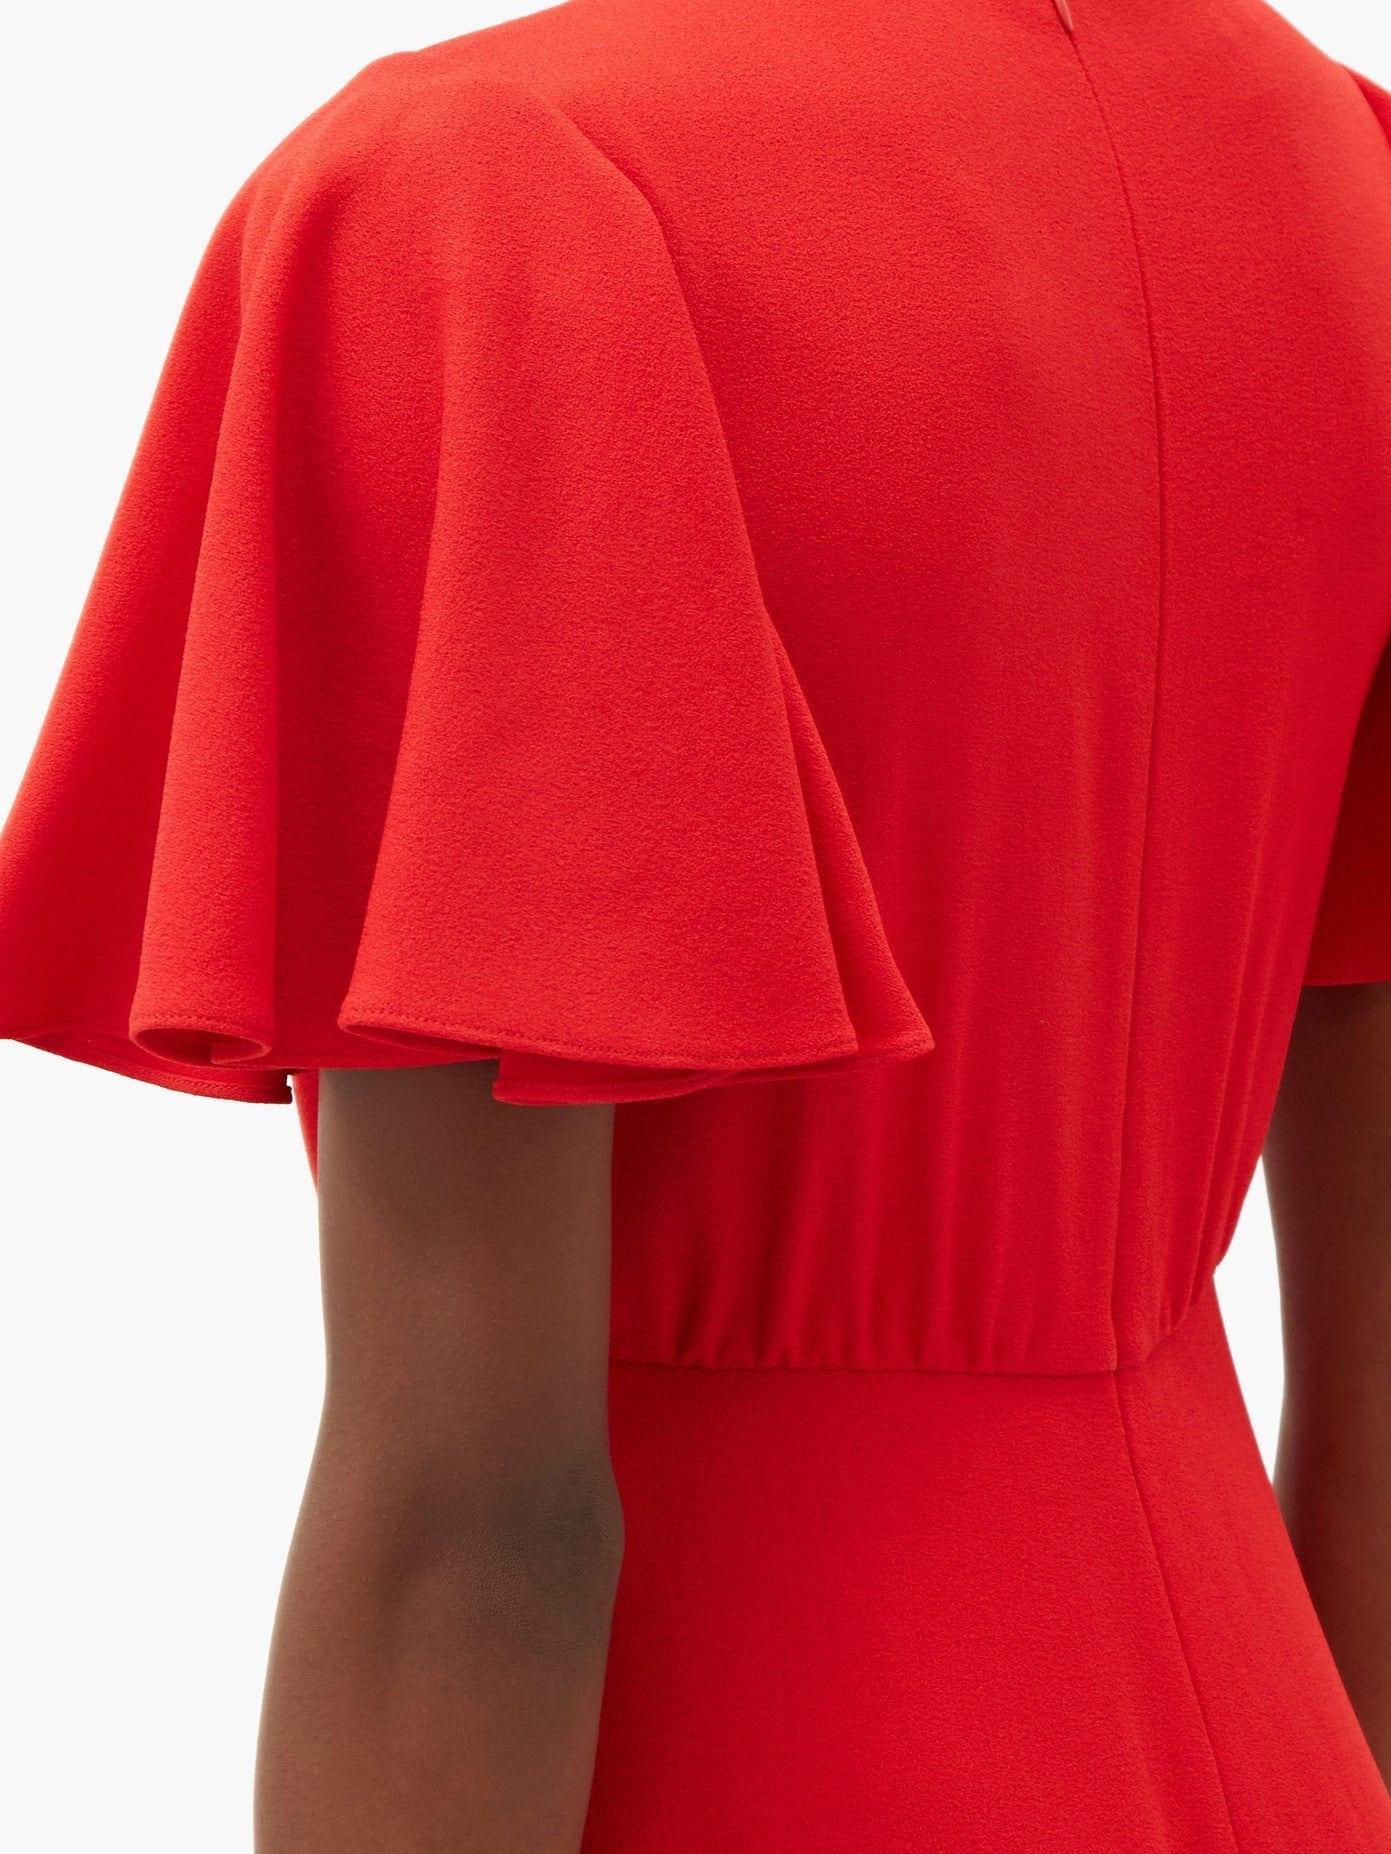 GIAMBATTISTA VALLI Knotted-neck Crepe Dress